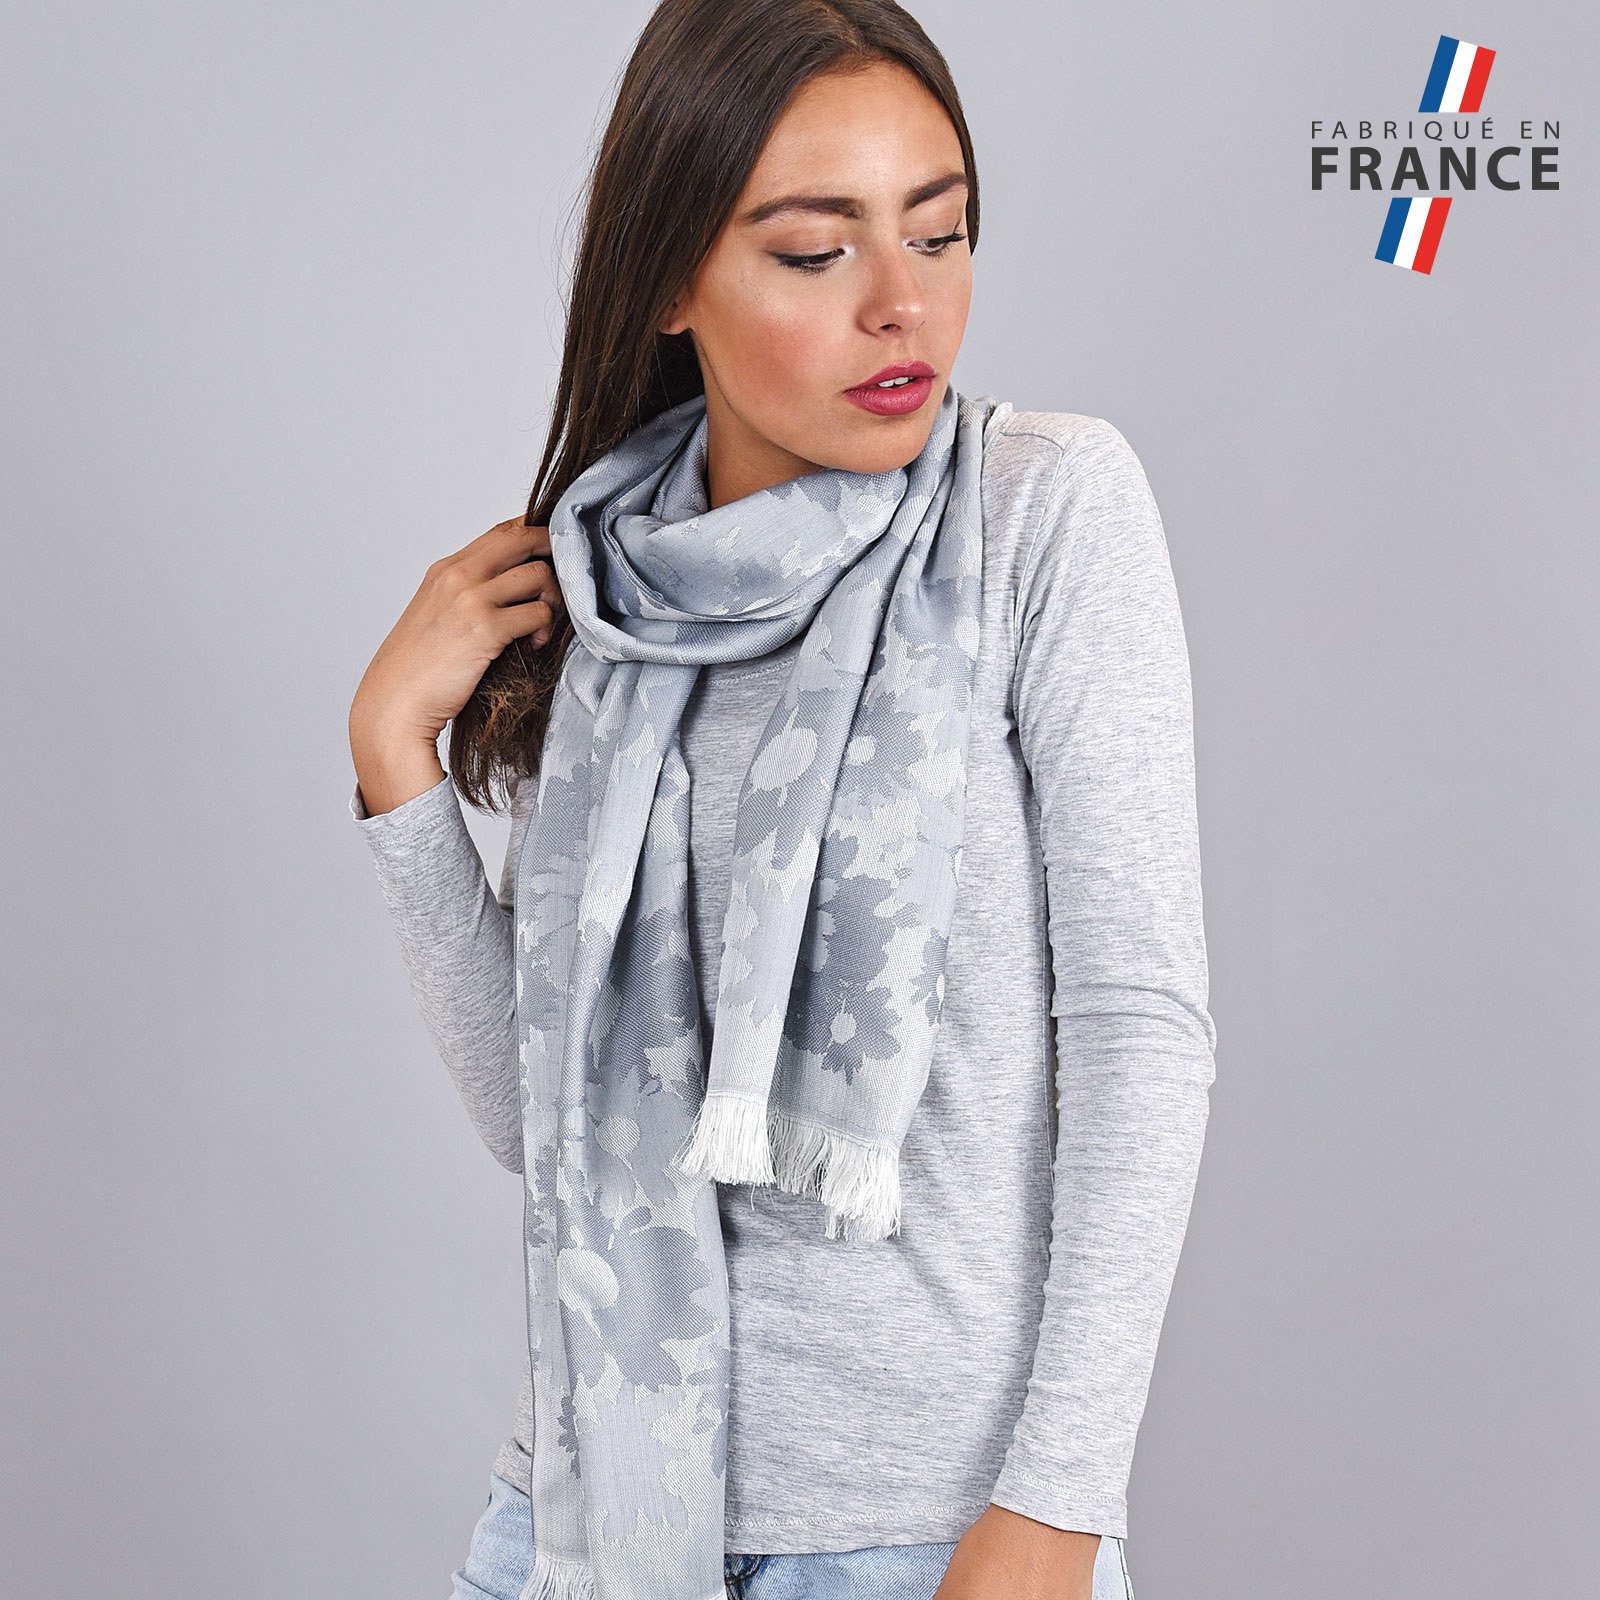 AT-03615-argent-VF16-LB_FR-echarpe-legere-fleurs-gris-argent-fabrication-france